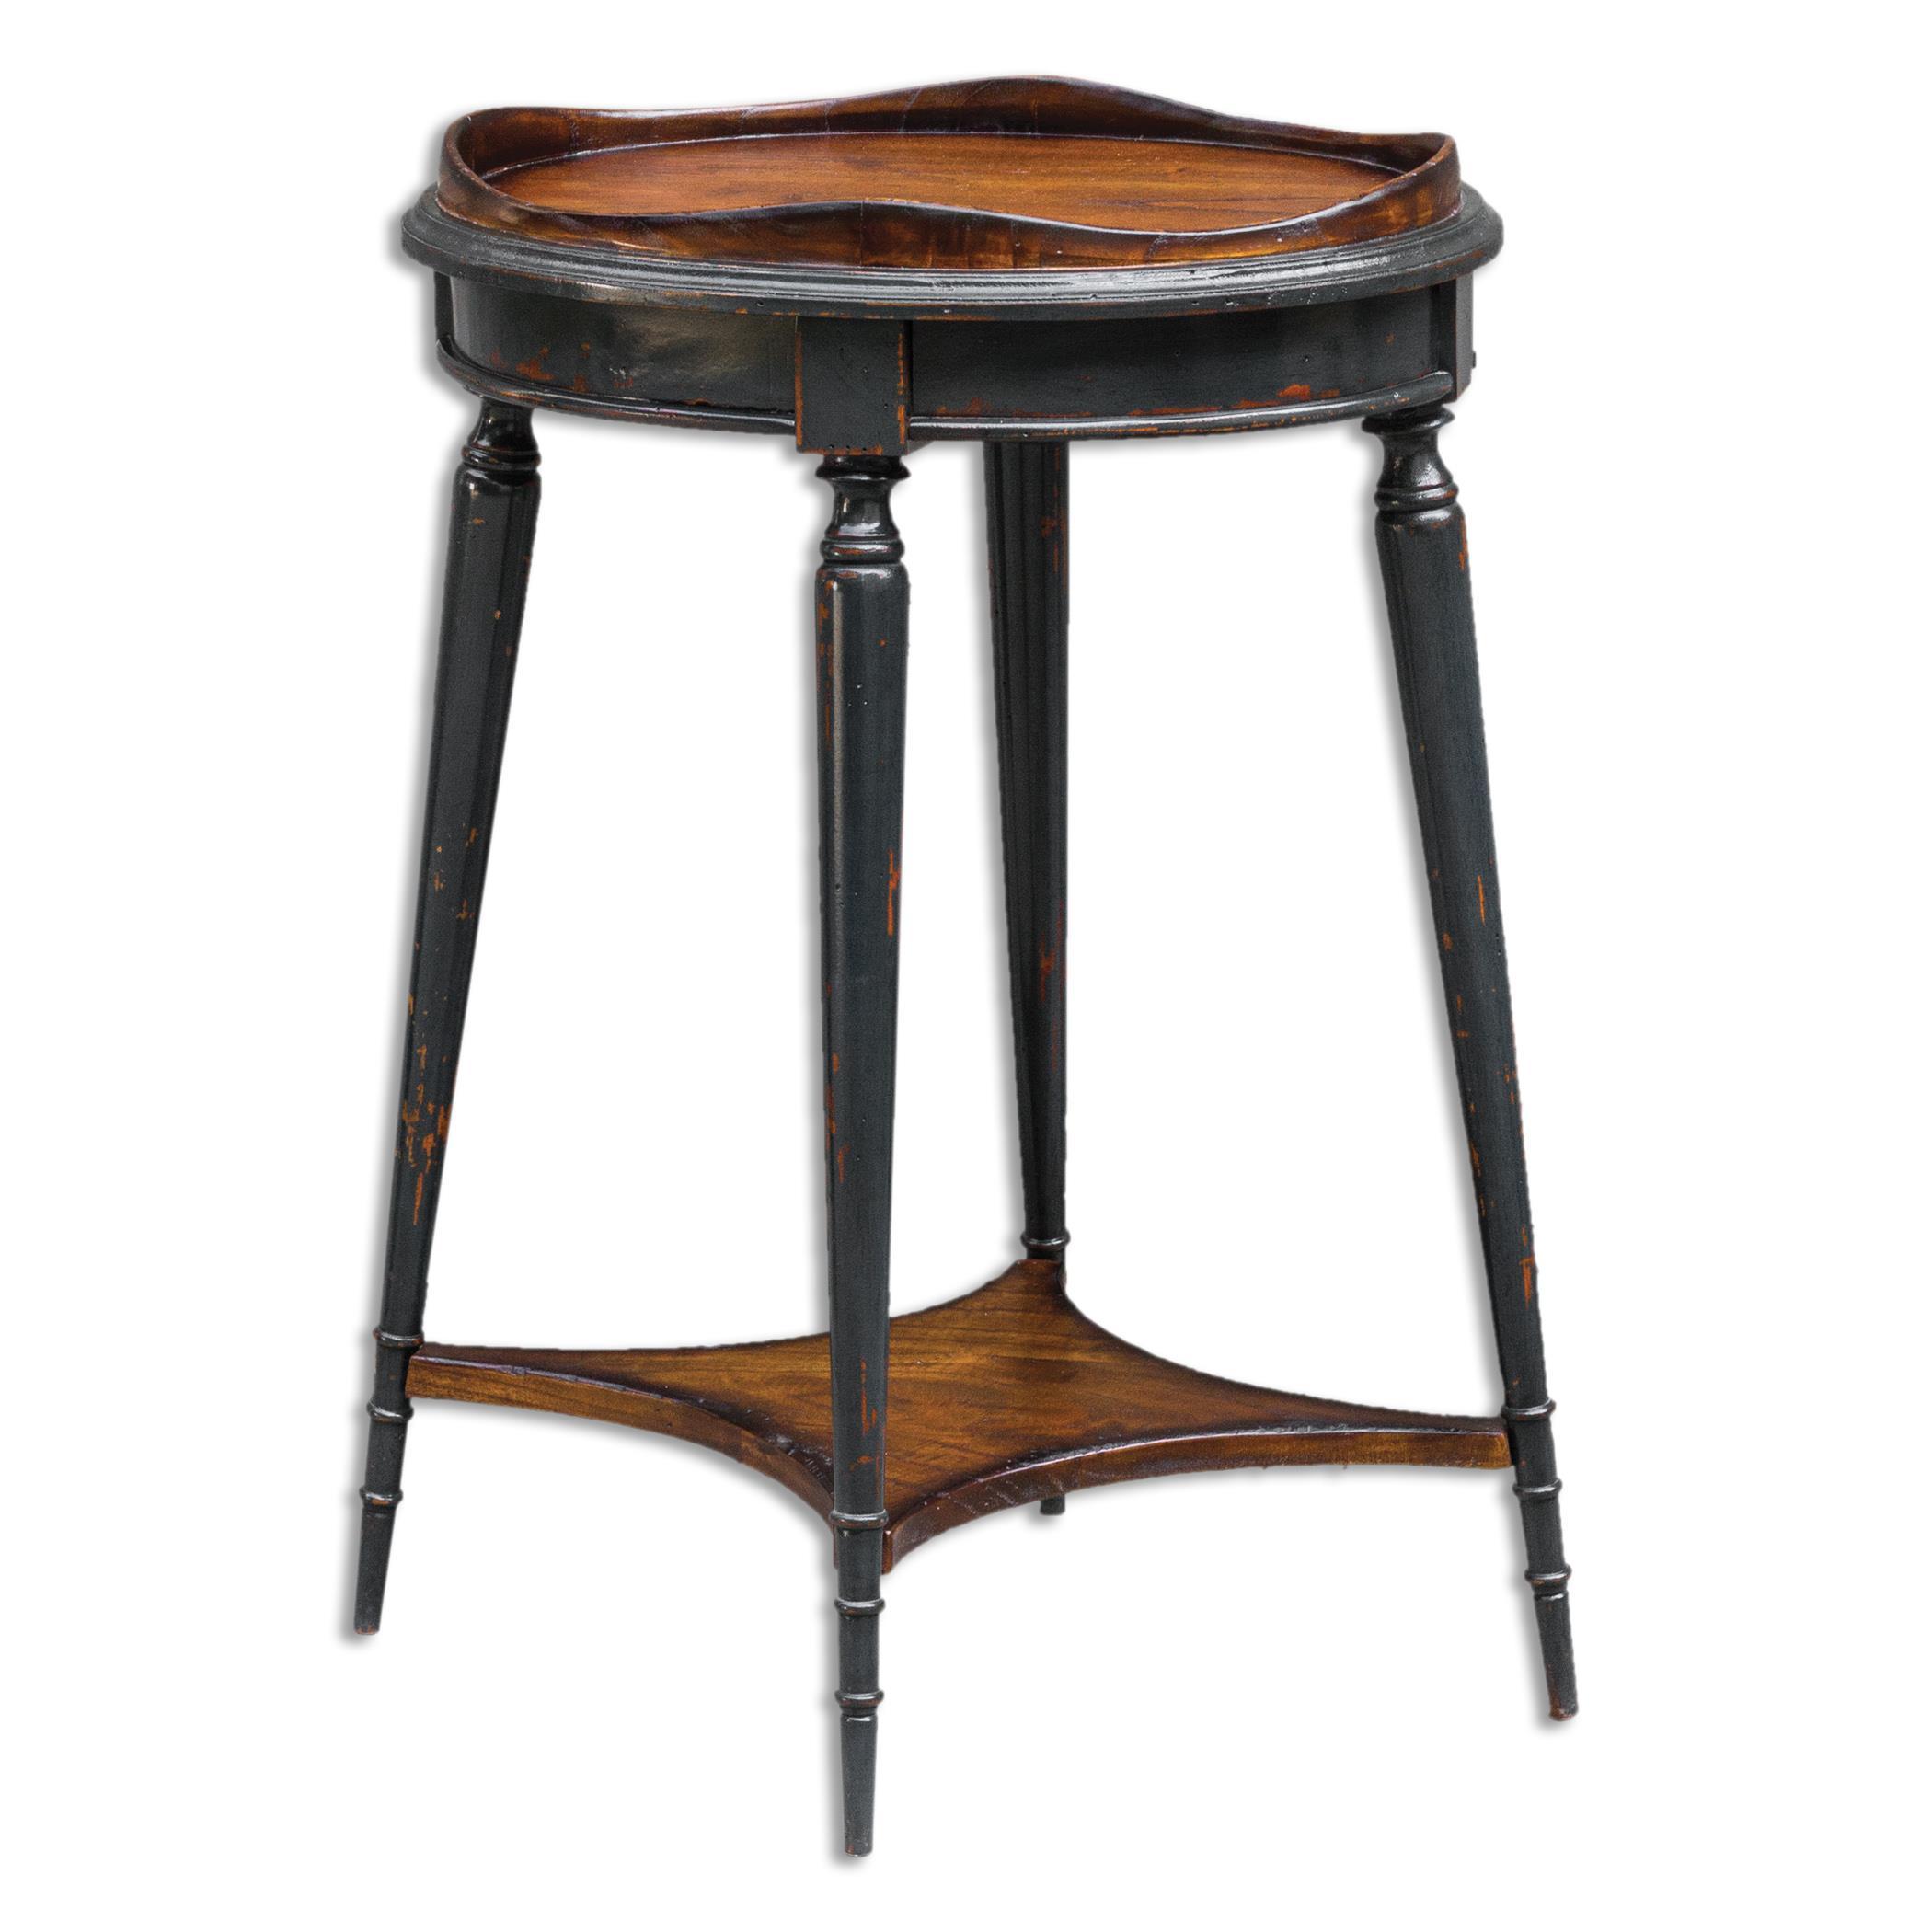 Uttermost Accent Furniture Agacio Round Accent Table - Item Number: 25647